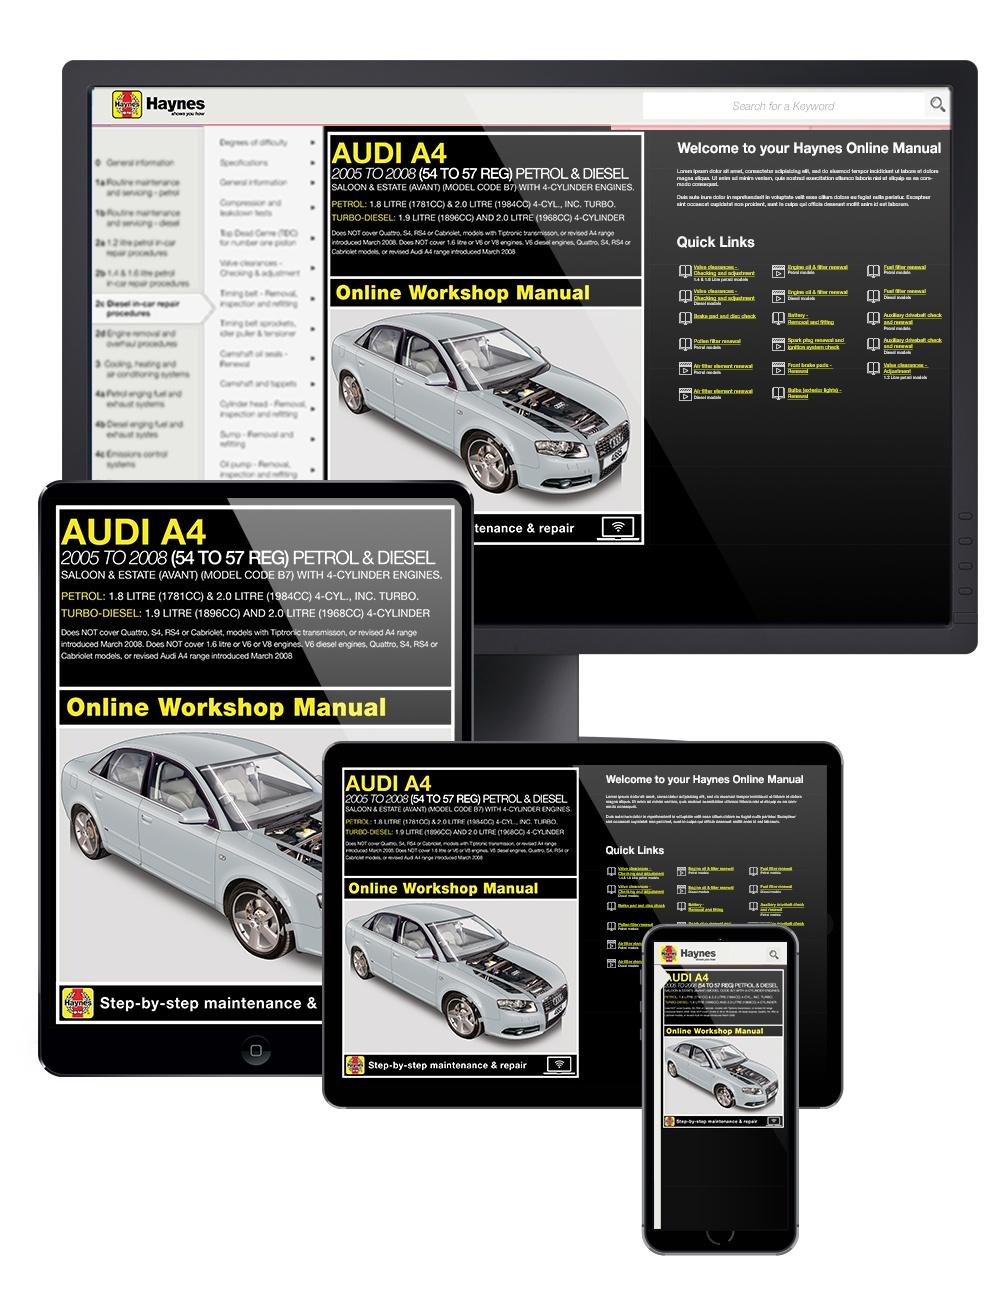 A4 Haynes Manuals 2005 Audi Engine Schematics Enlarge